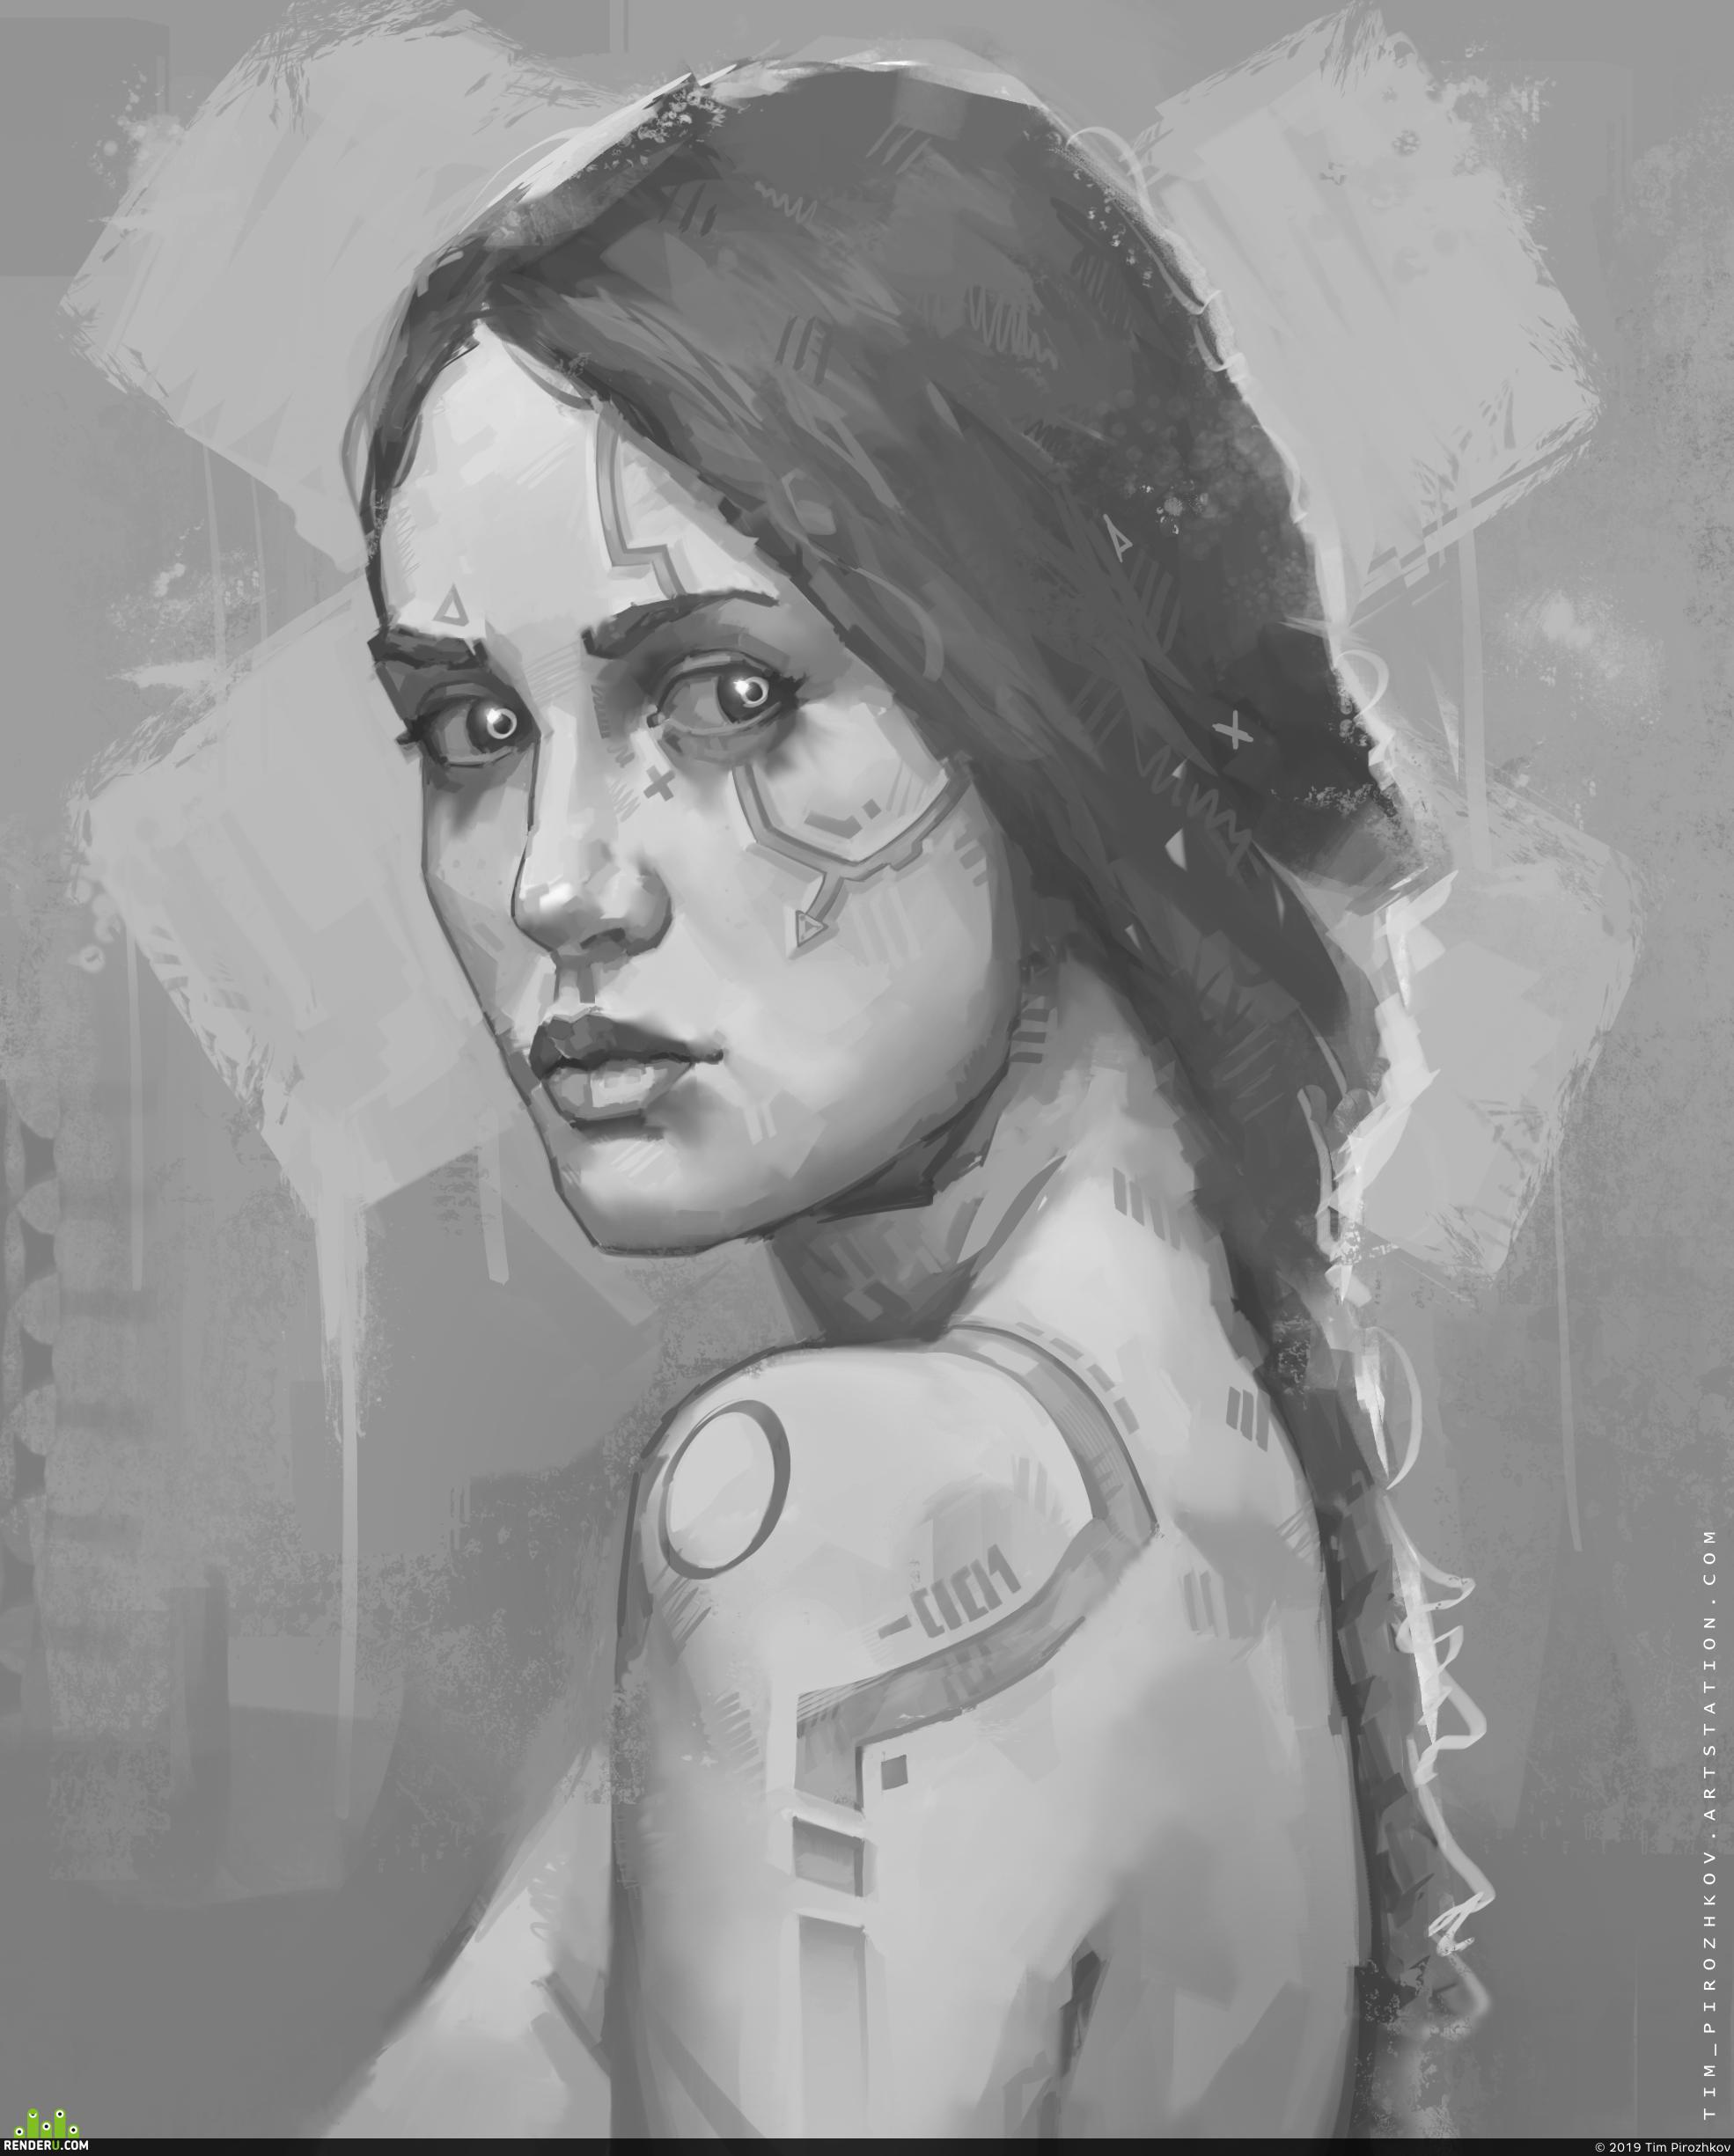 preview Cyberpunk girl